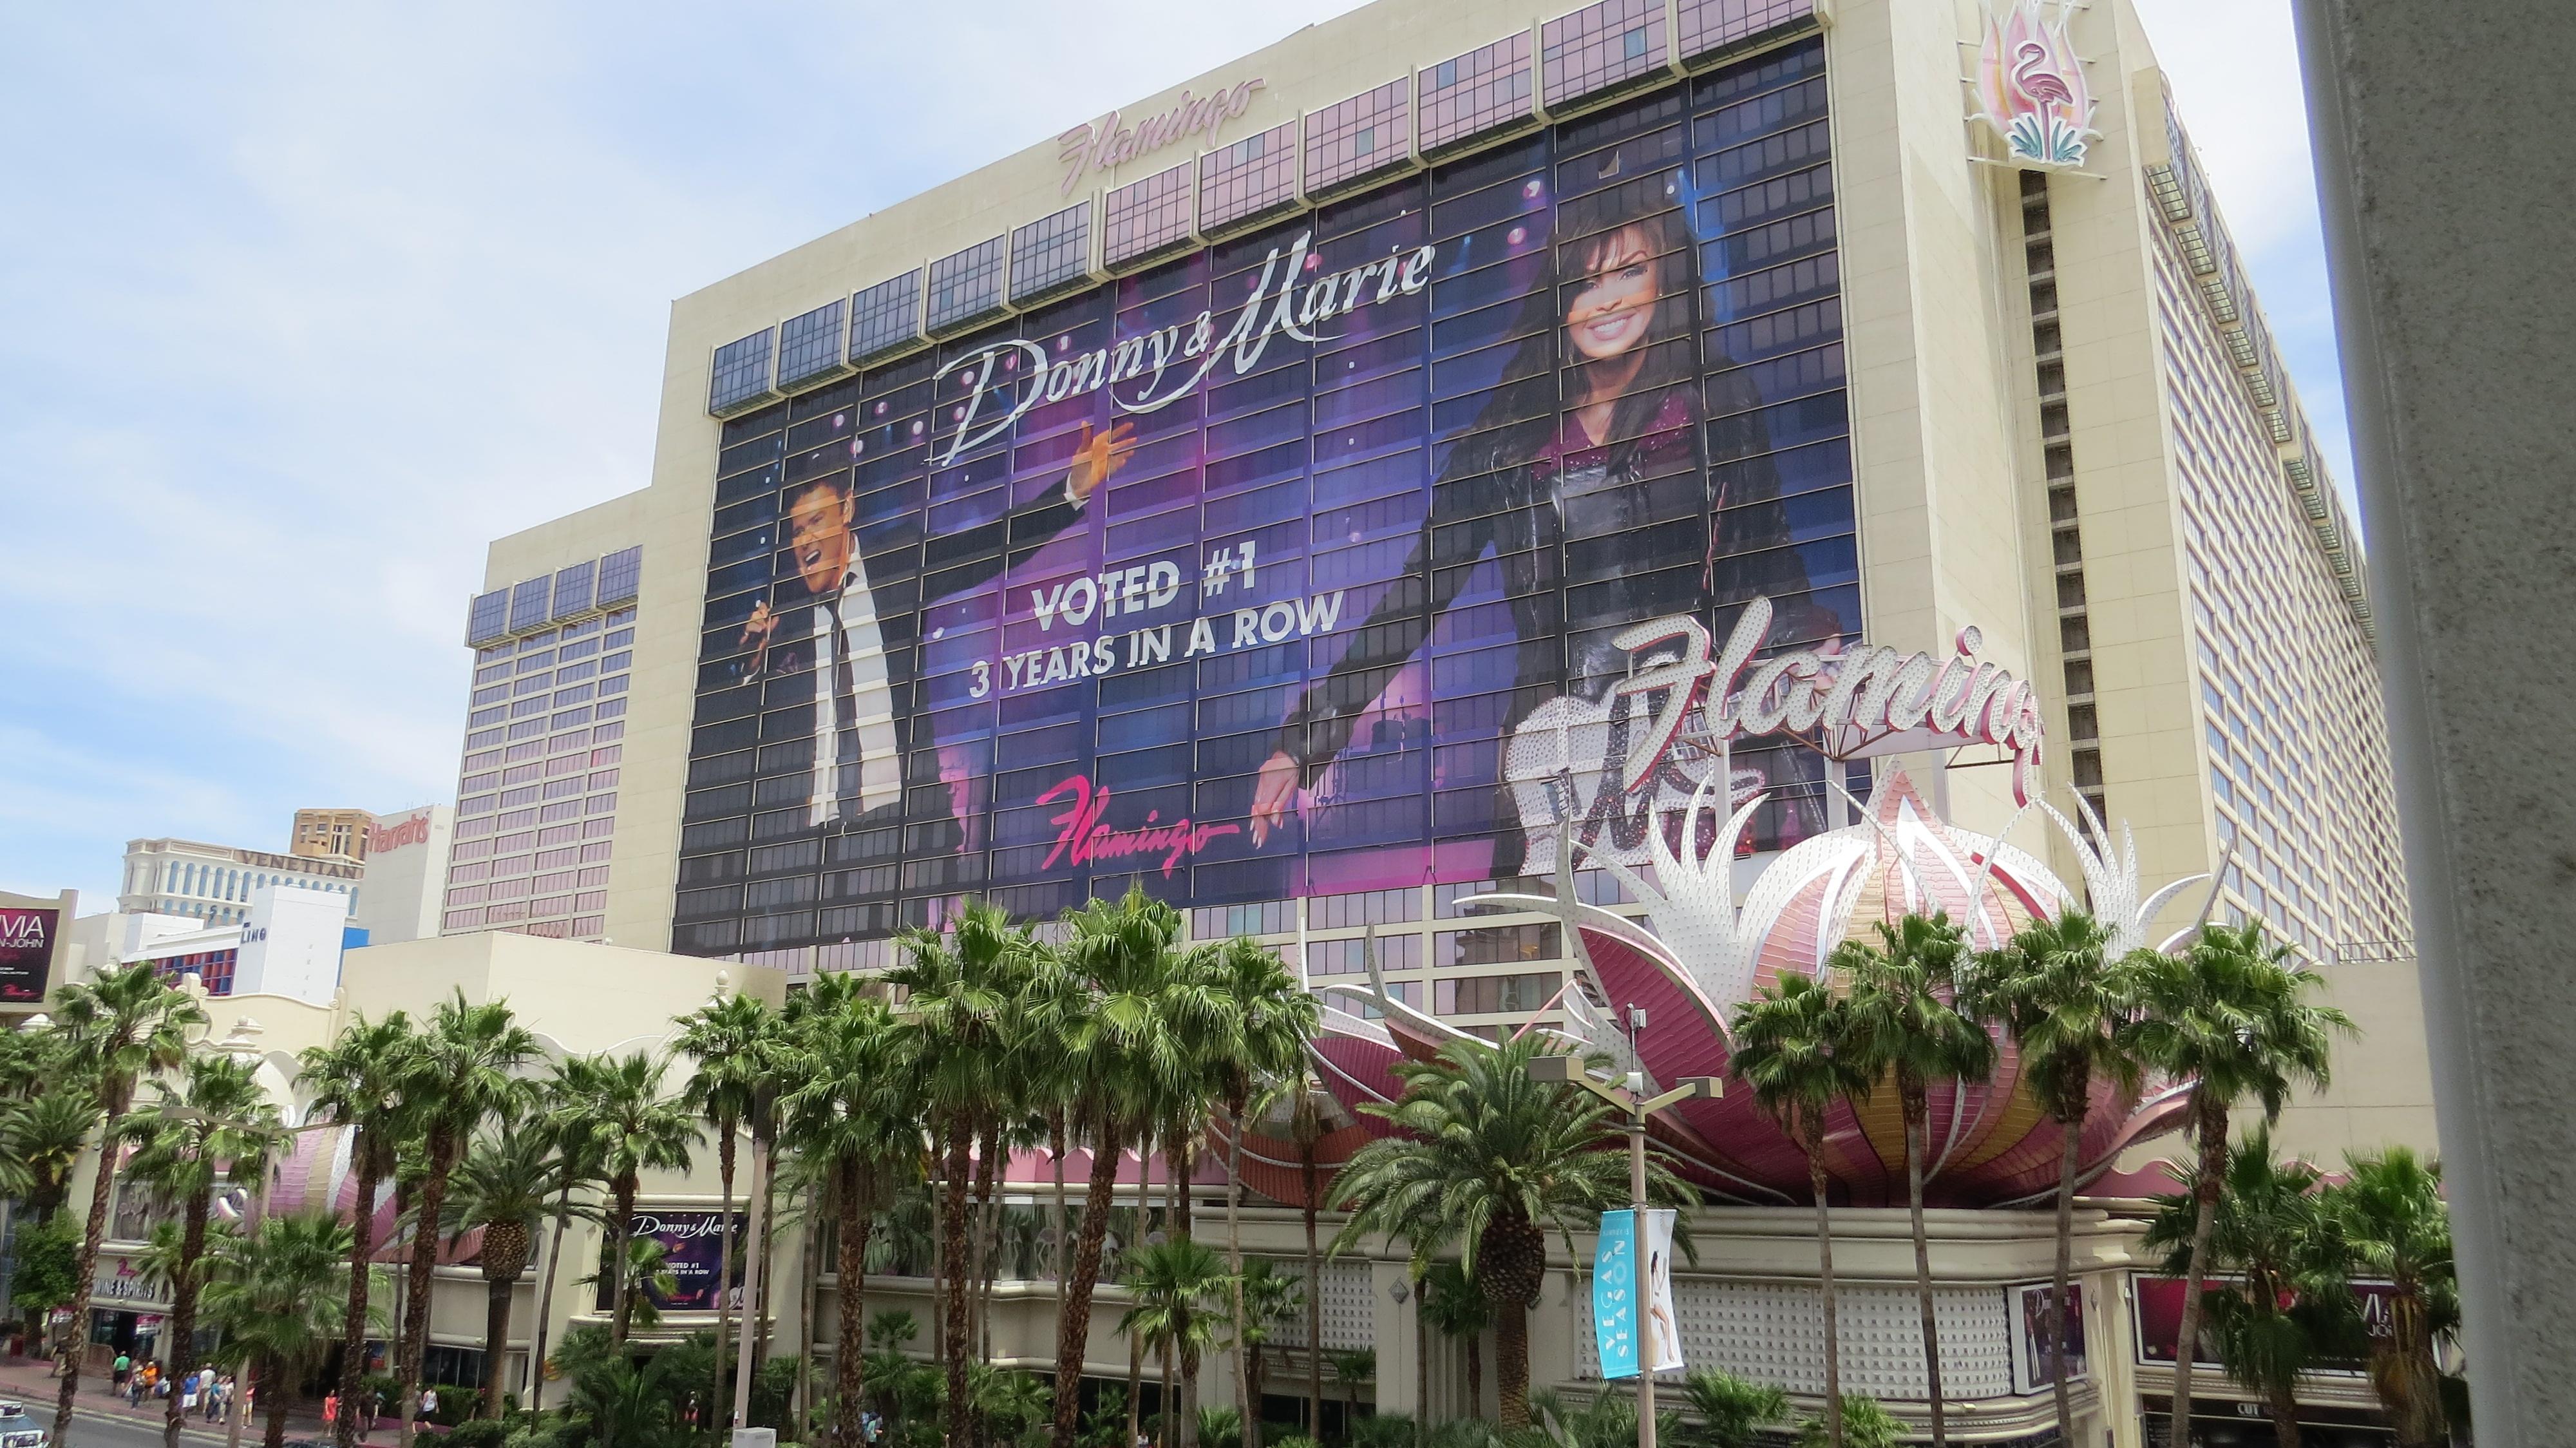 Viva Las Vegasdonny And Marie Osmondno Show Shelley Kassian